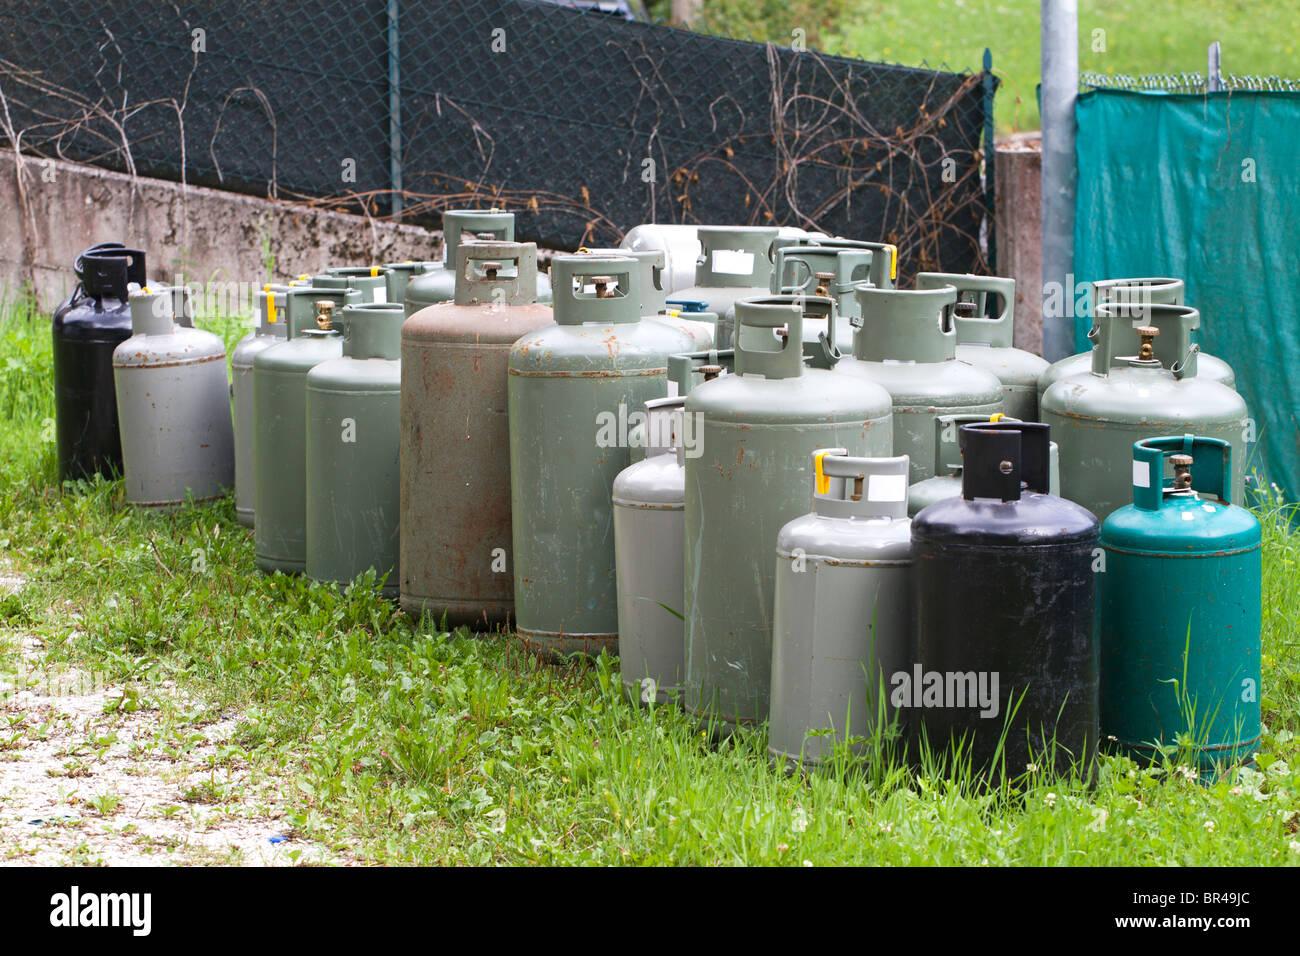 Gas cylinder - Stock Image